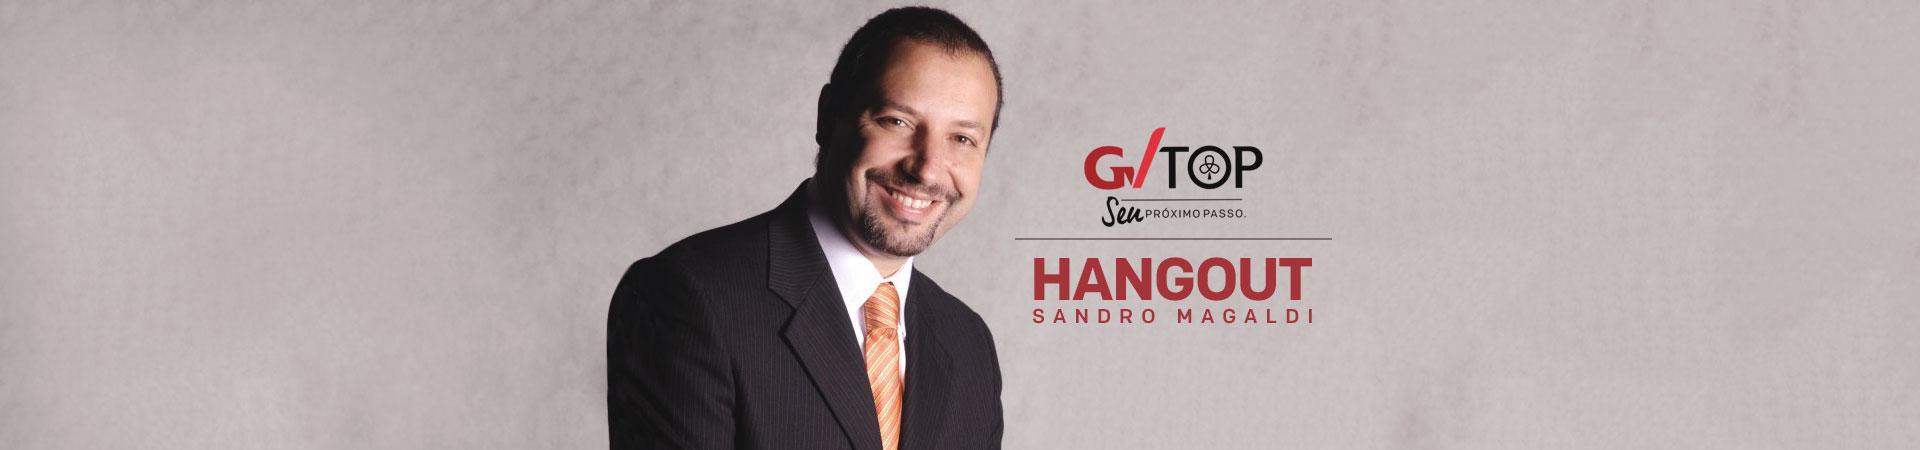 _hangout_magaldi2